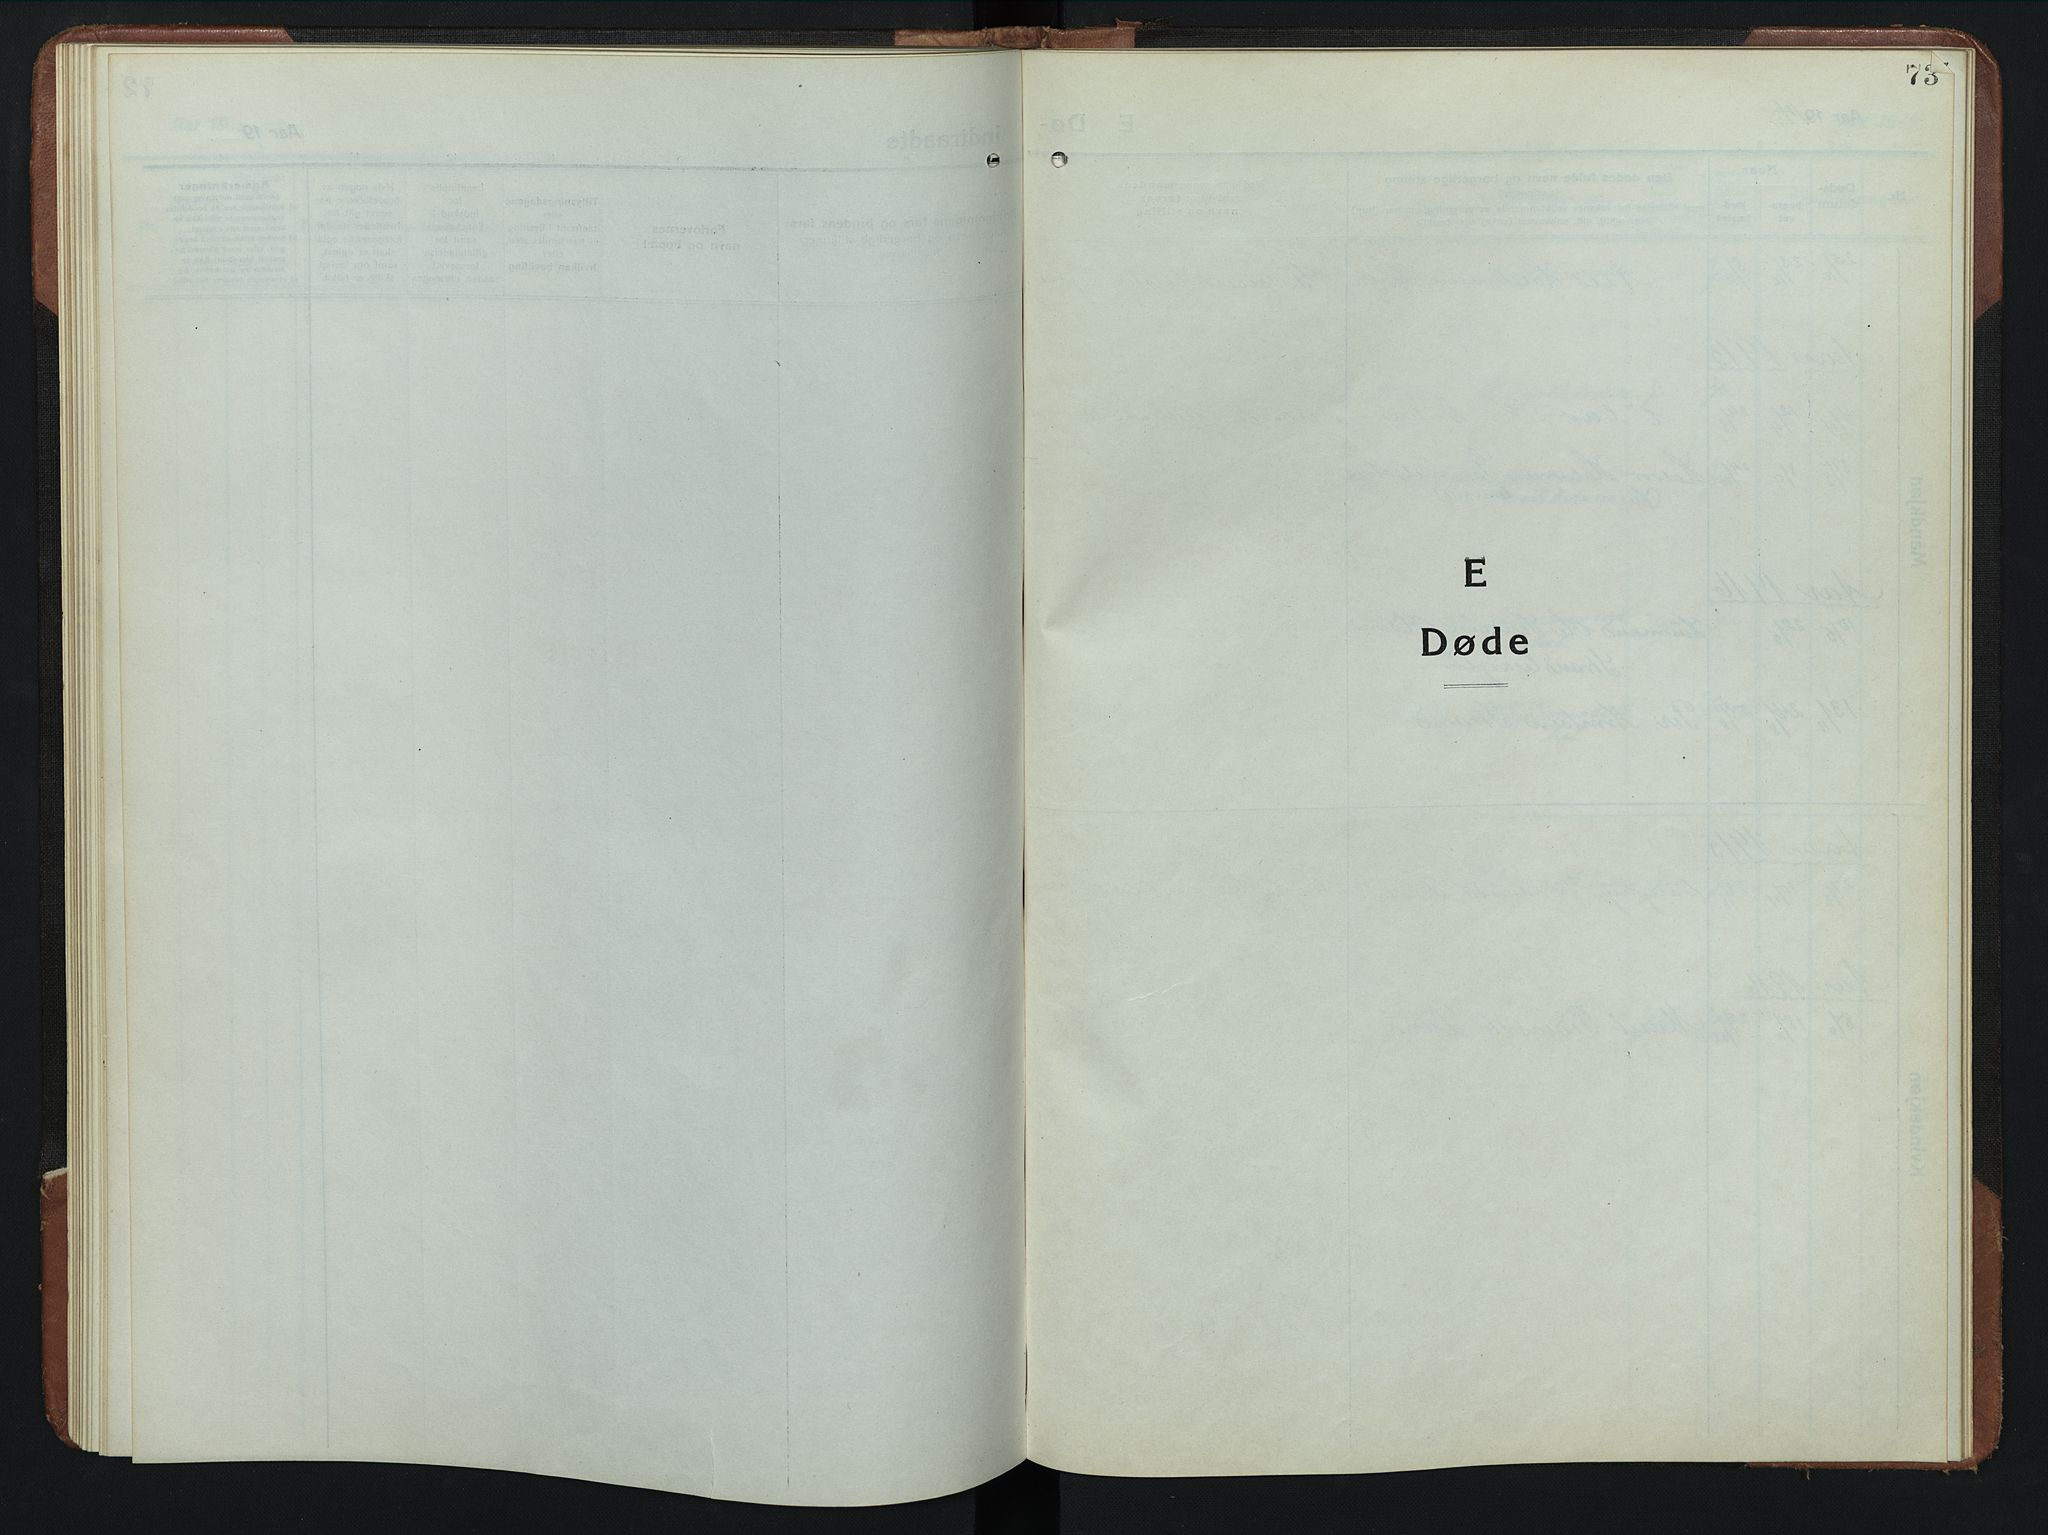 SAH, Rendalen prestekontor, H/Ha/Hab/L0008: Parish register (copy) no. 8, 1914-1948, p. 73